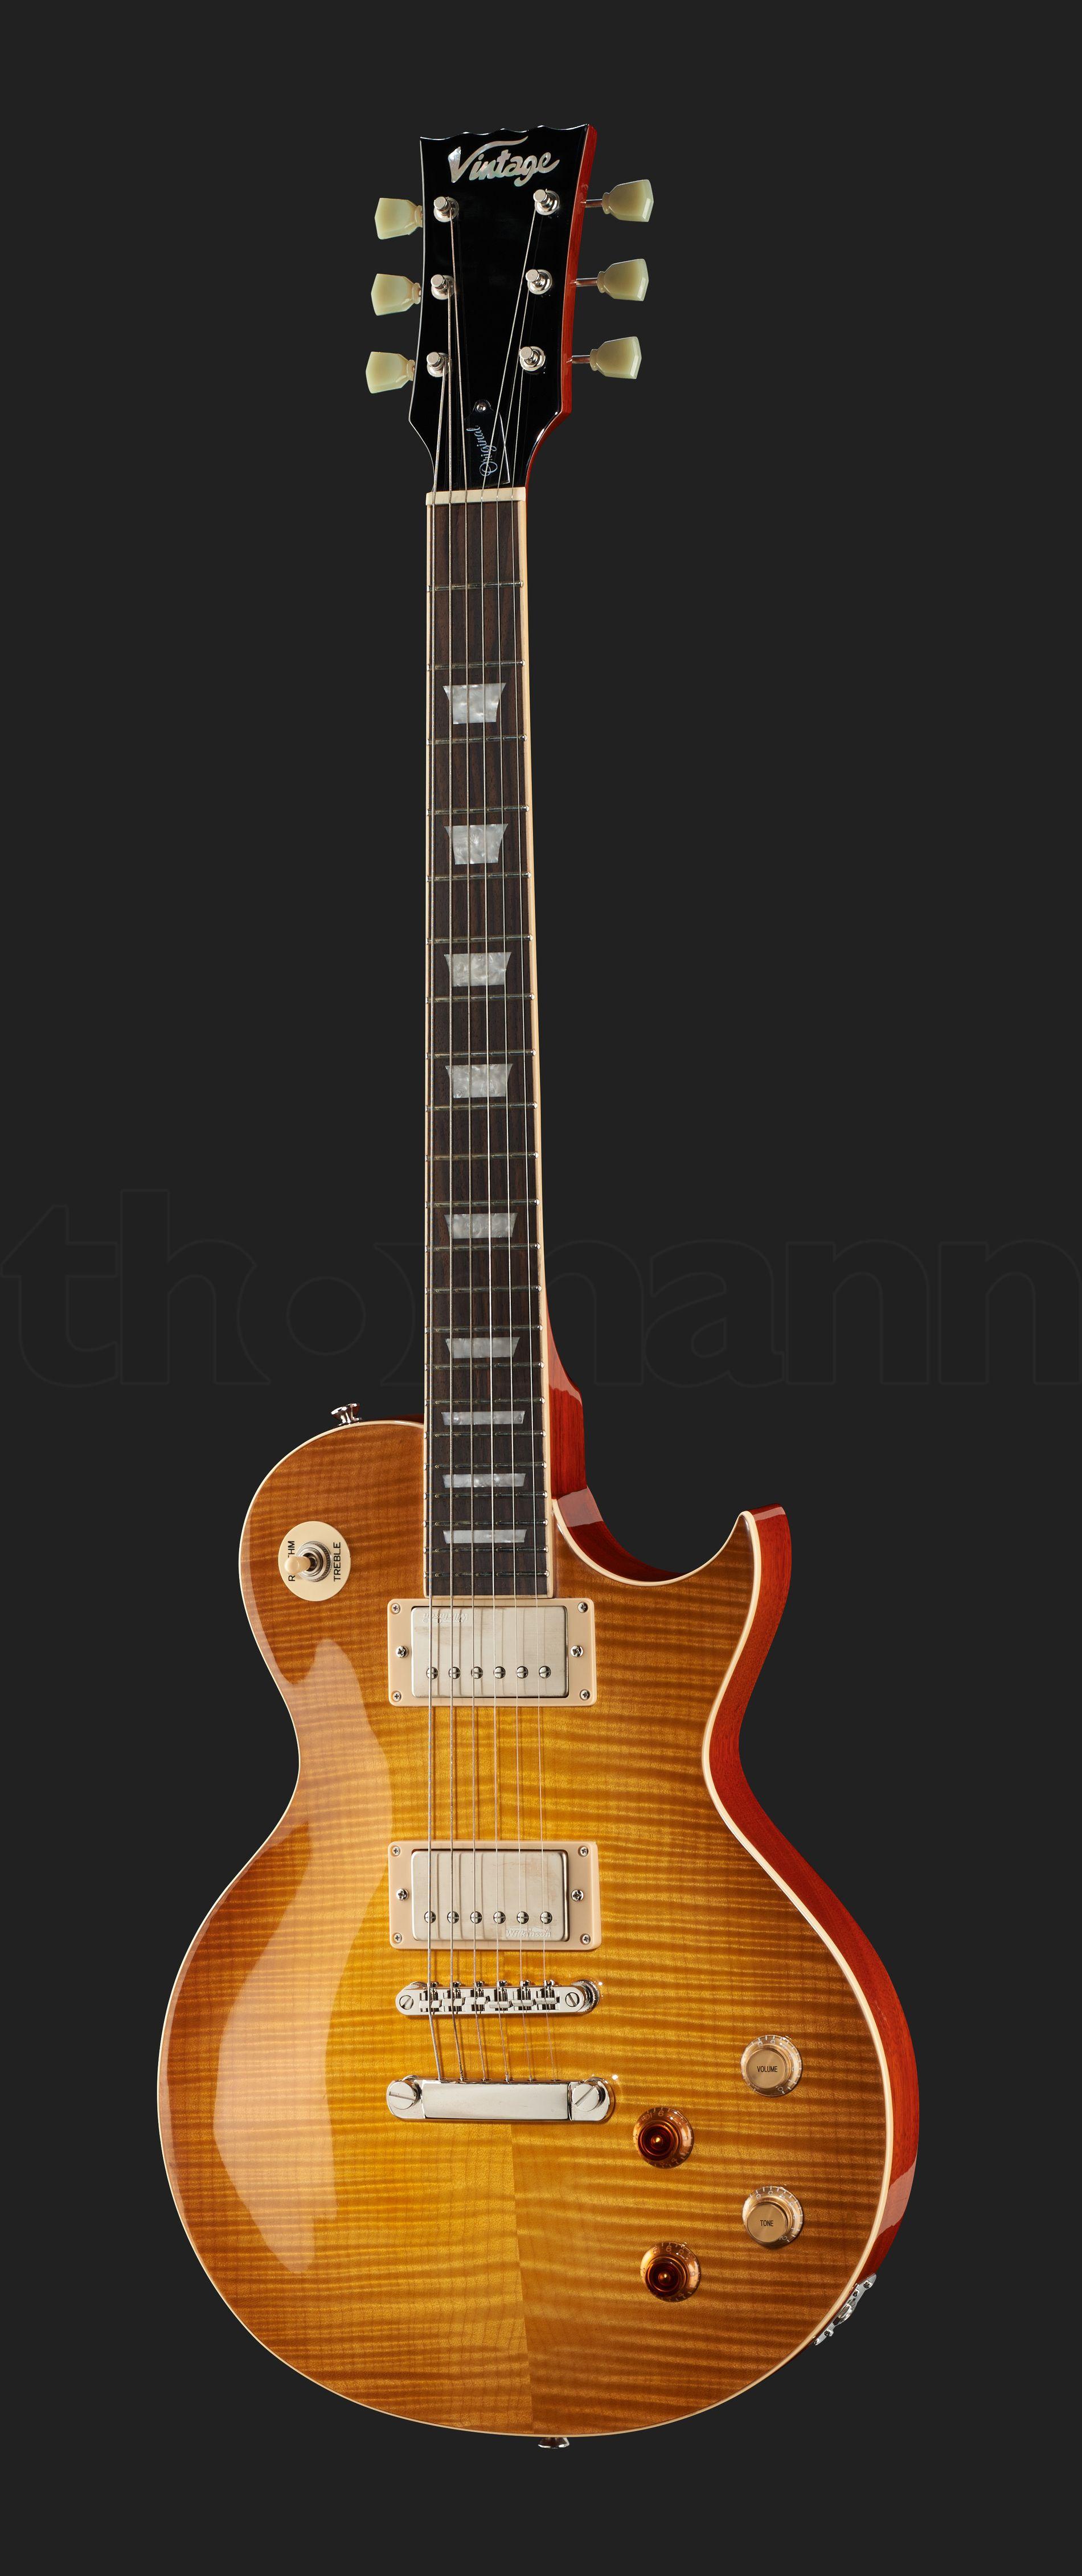 Vintage V100pgm Lemon Drop Reissued Cool Guitar Lemon Drop Vintage